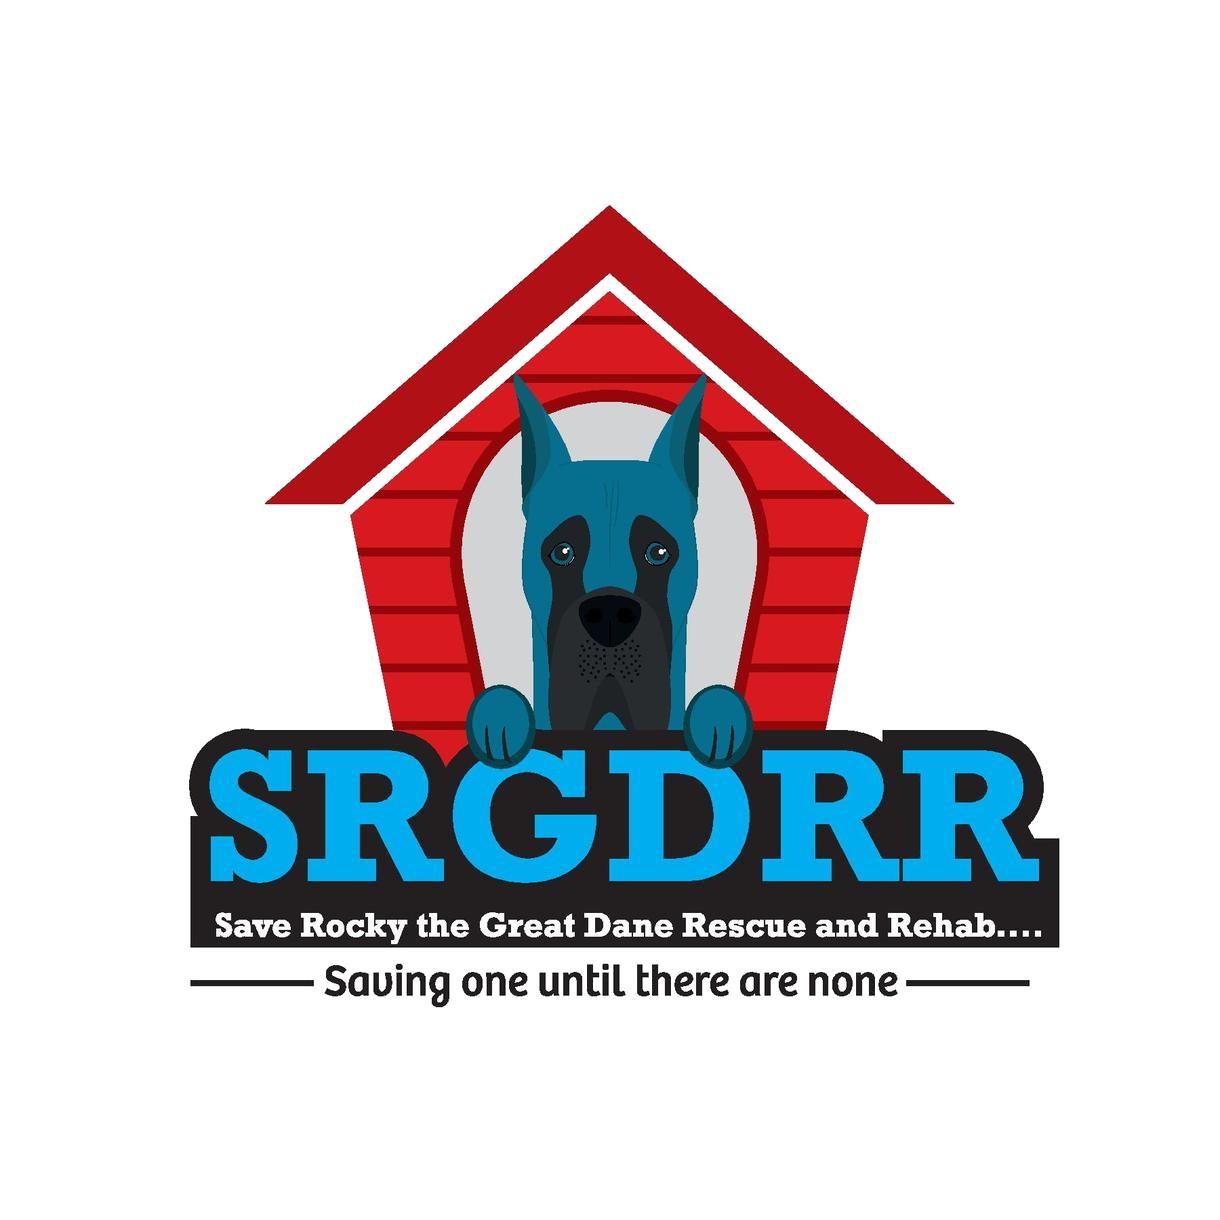 SRGDRR Inc aka Save Rocky the Great Dane Rescue